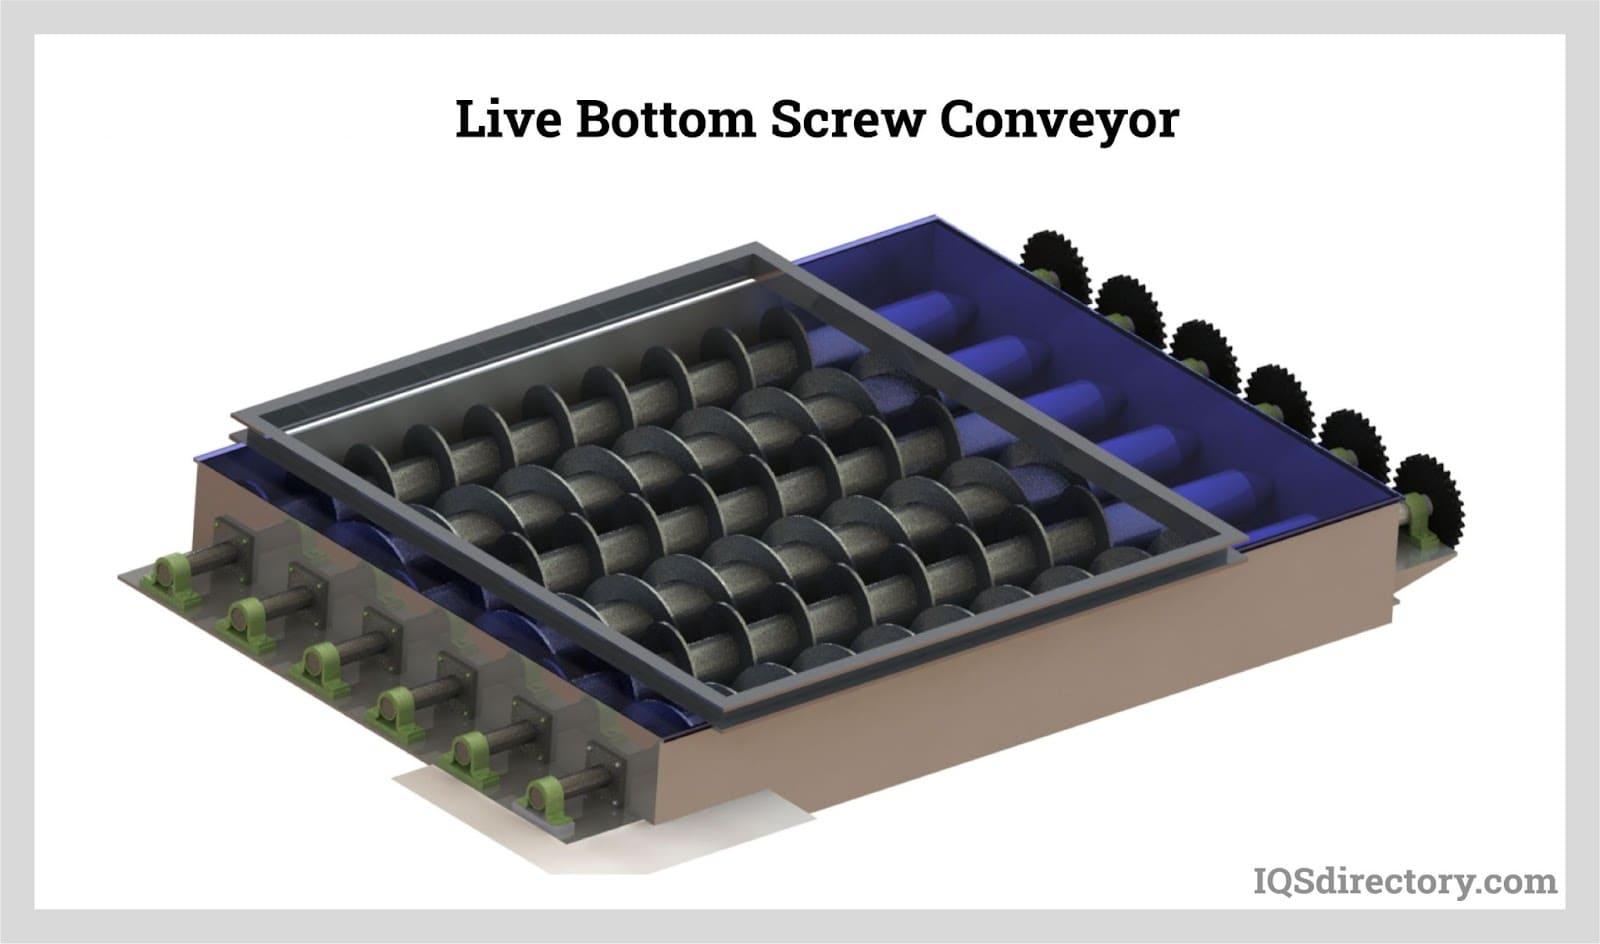 Live Bottom Screw Conveyor